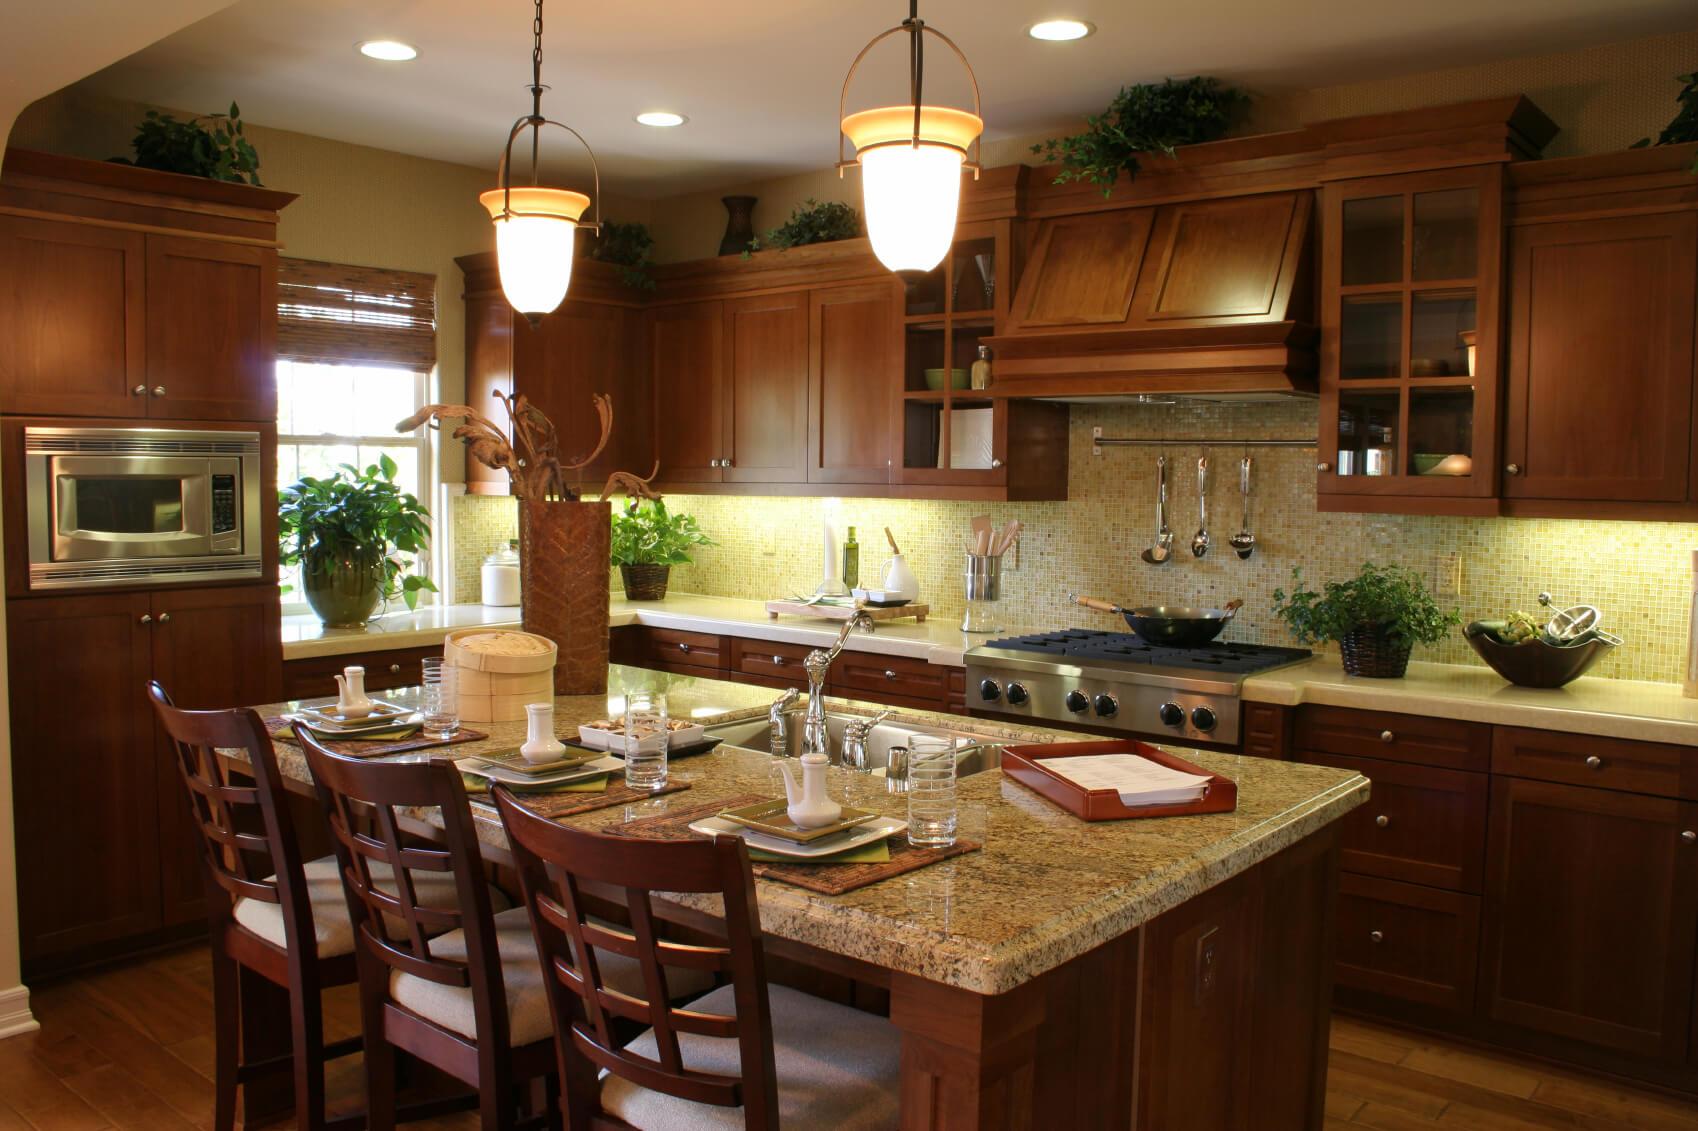 52 Dark Kitchens with Dark Wood and Black Kitchen Cabinets on Maple Kitchen Cabinets With Dark Wood Floors Dark Countertops  id=82902